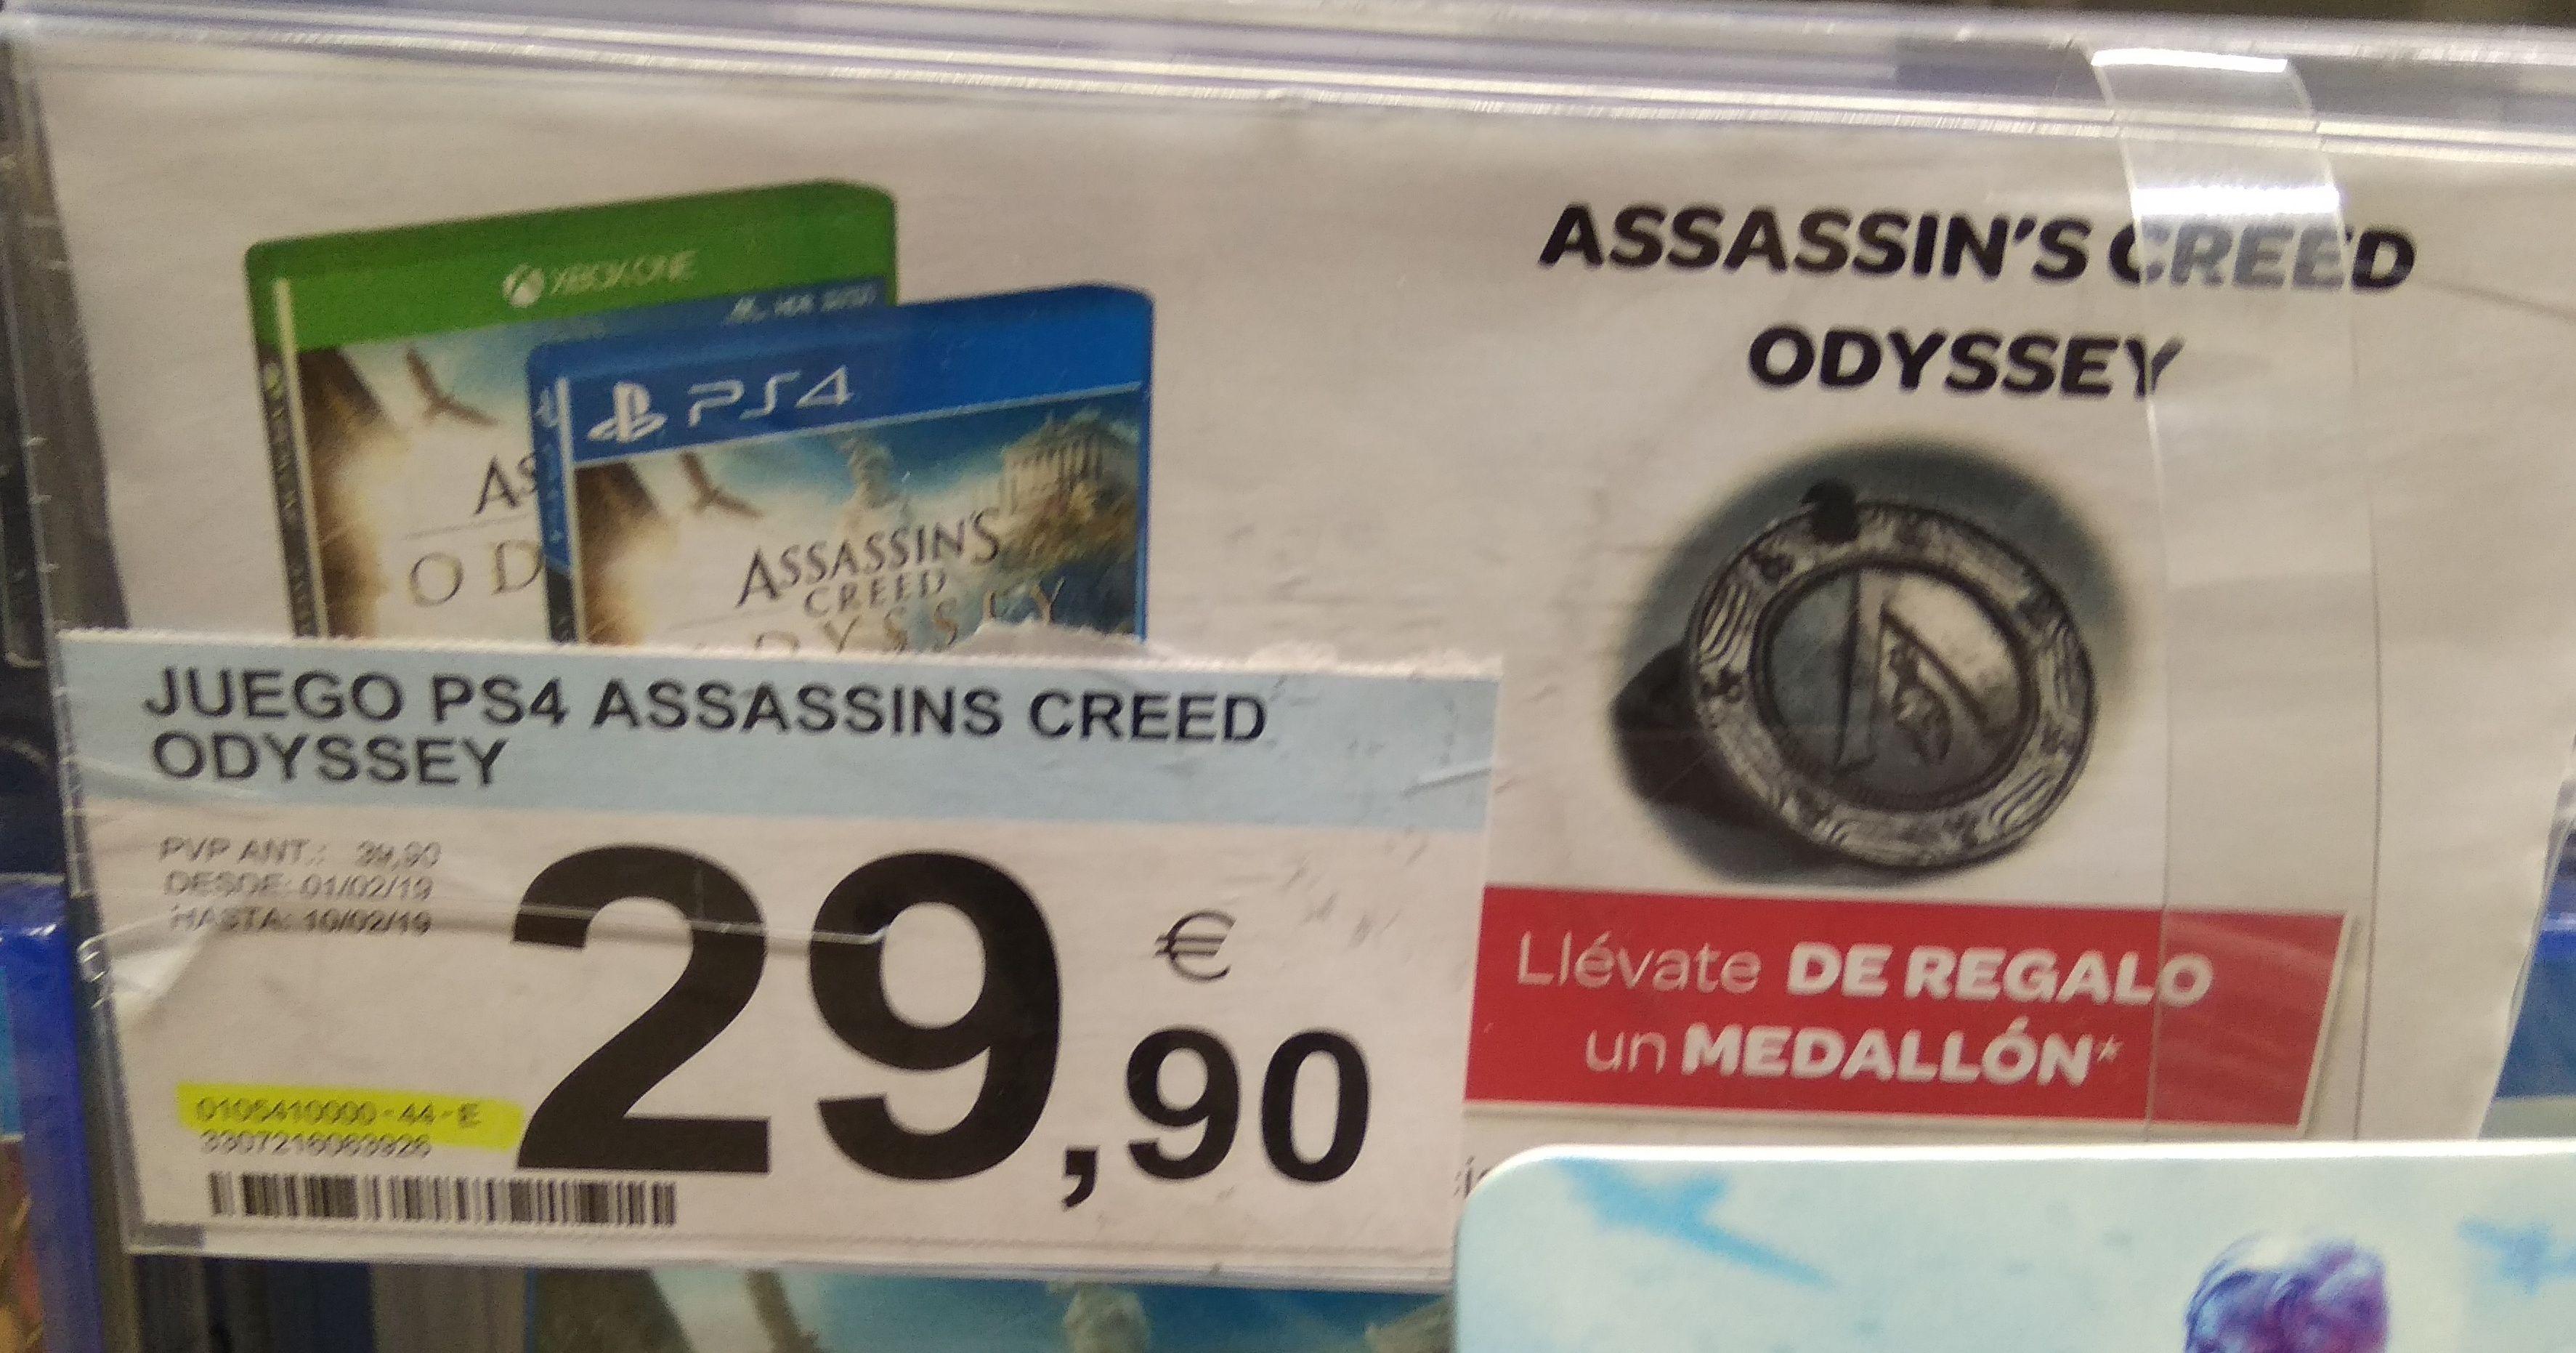 Assassin's Creed Odyssey (PS4, XB1) + medallón de regalo (Carrefour Madrid Mar de Cristal)